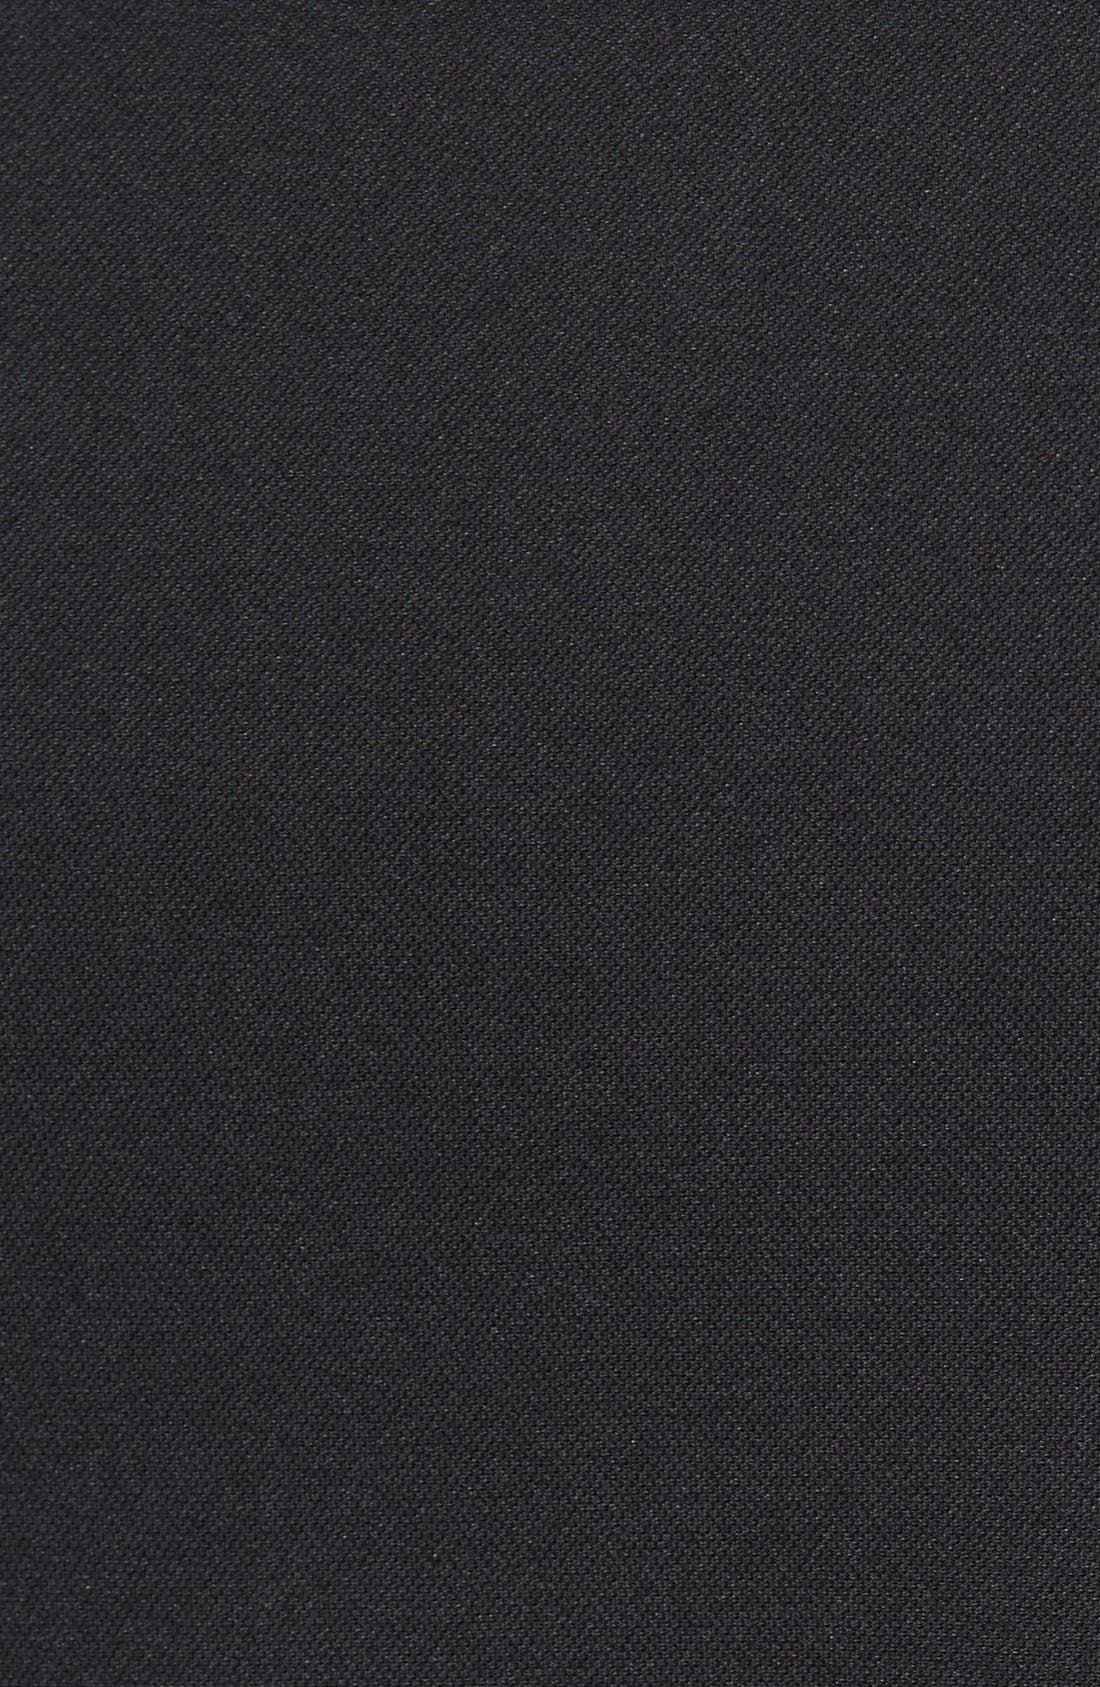 LACOSTE, Tipped Quick Dry Piqué Polo, Alternate thumbnail 5, color, BLACK/ WHITE